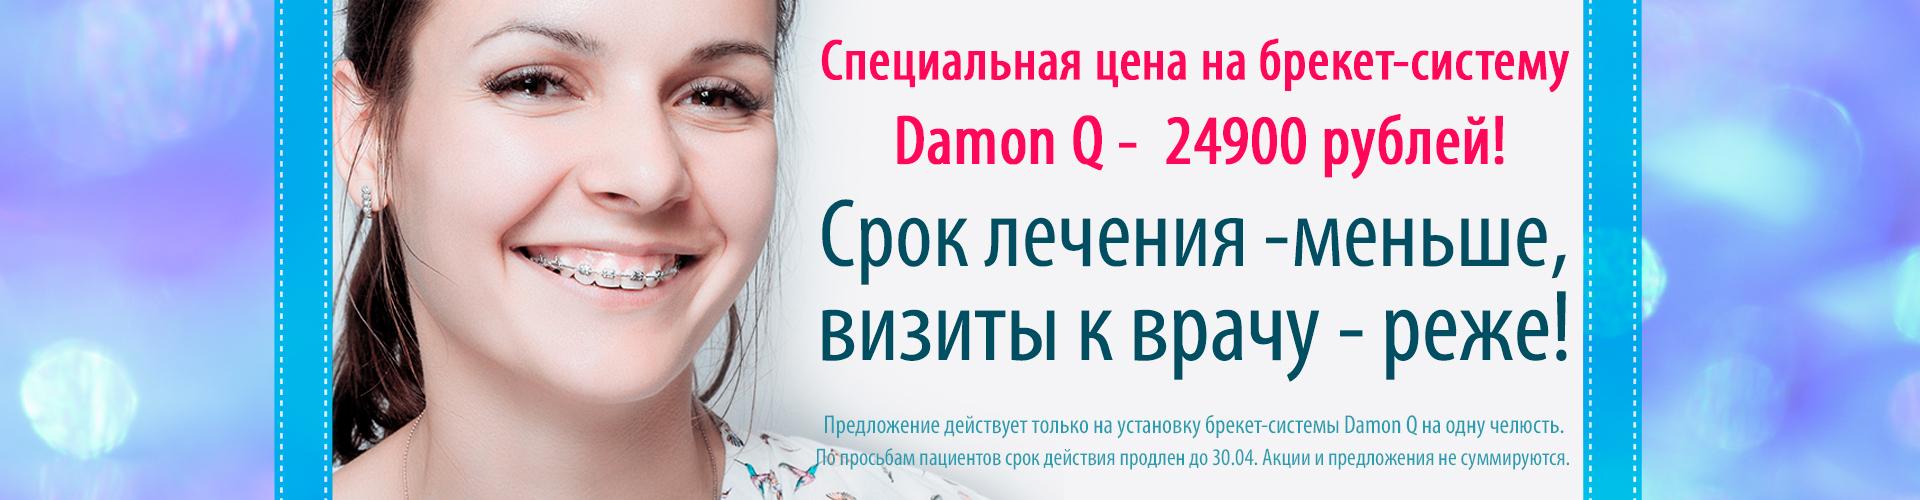 Специальная цена на брекет-систему Damon Q